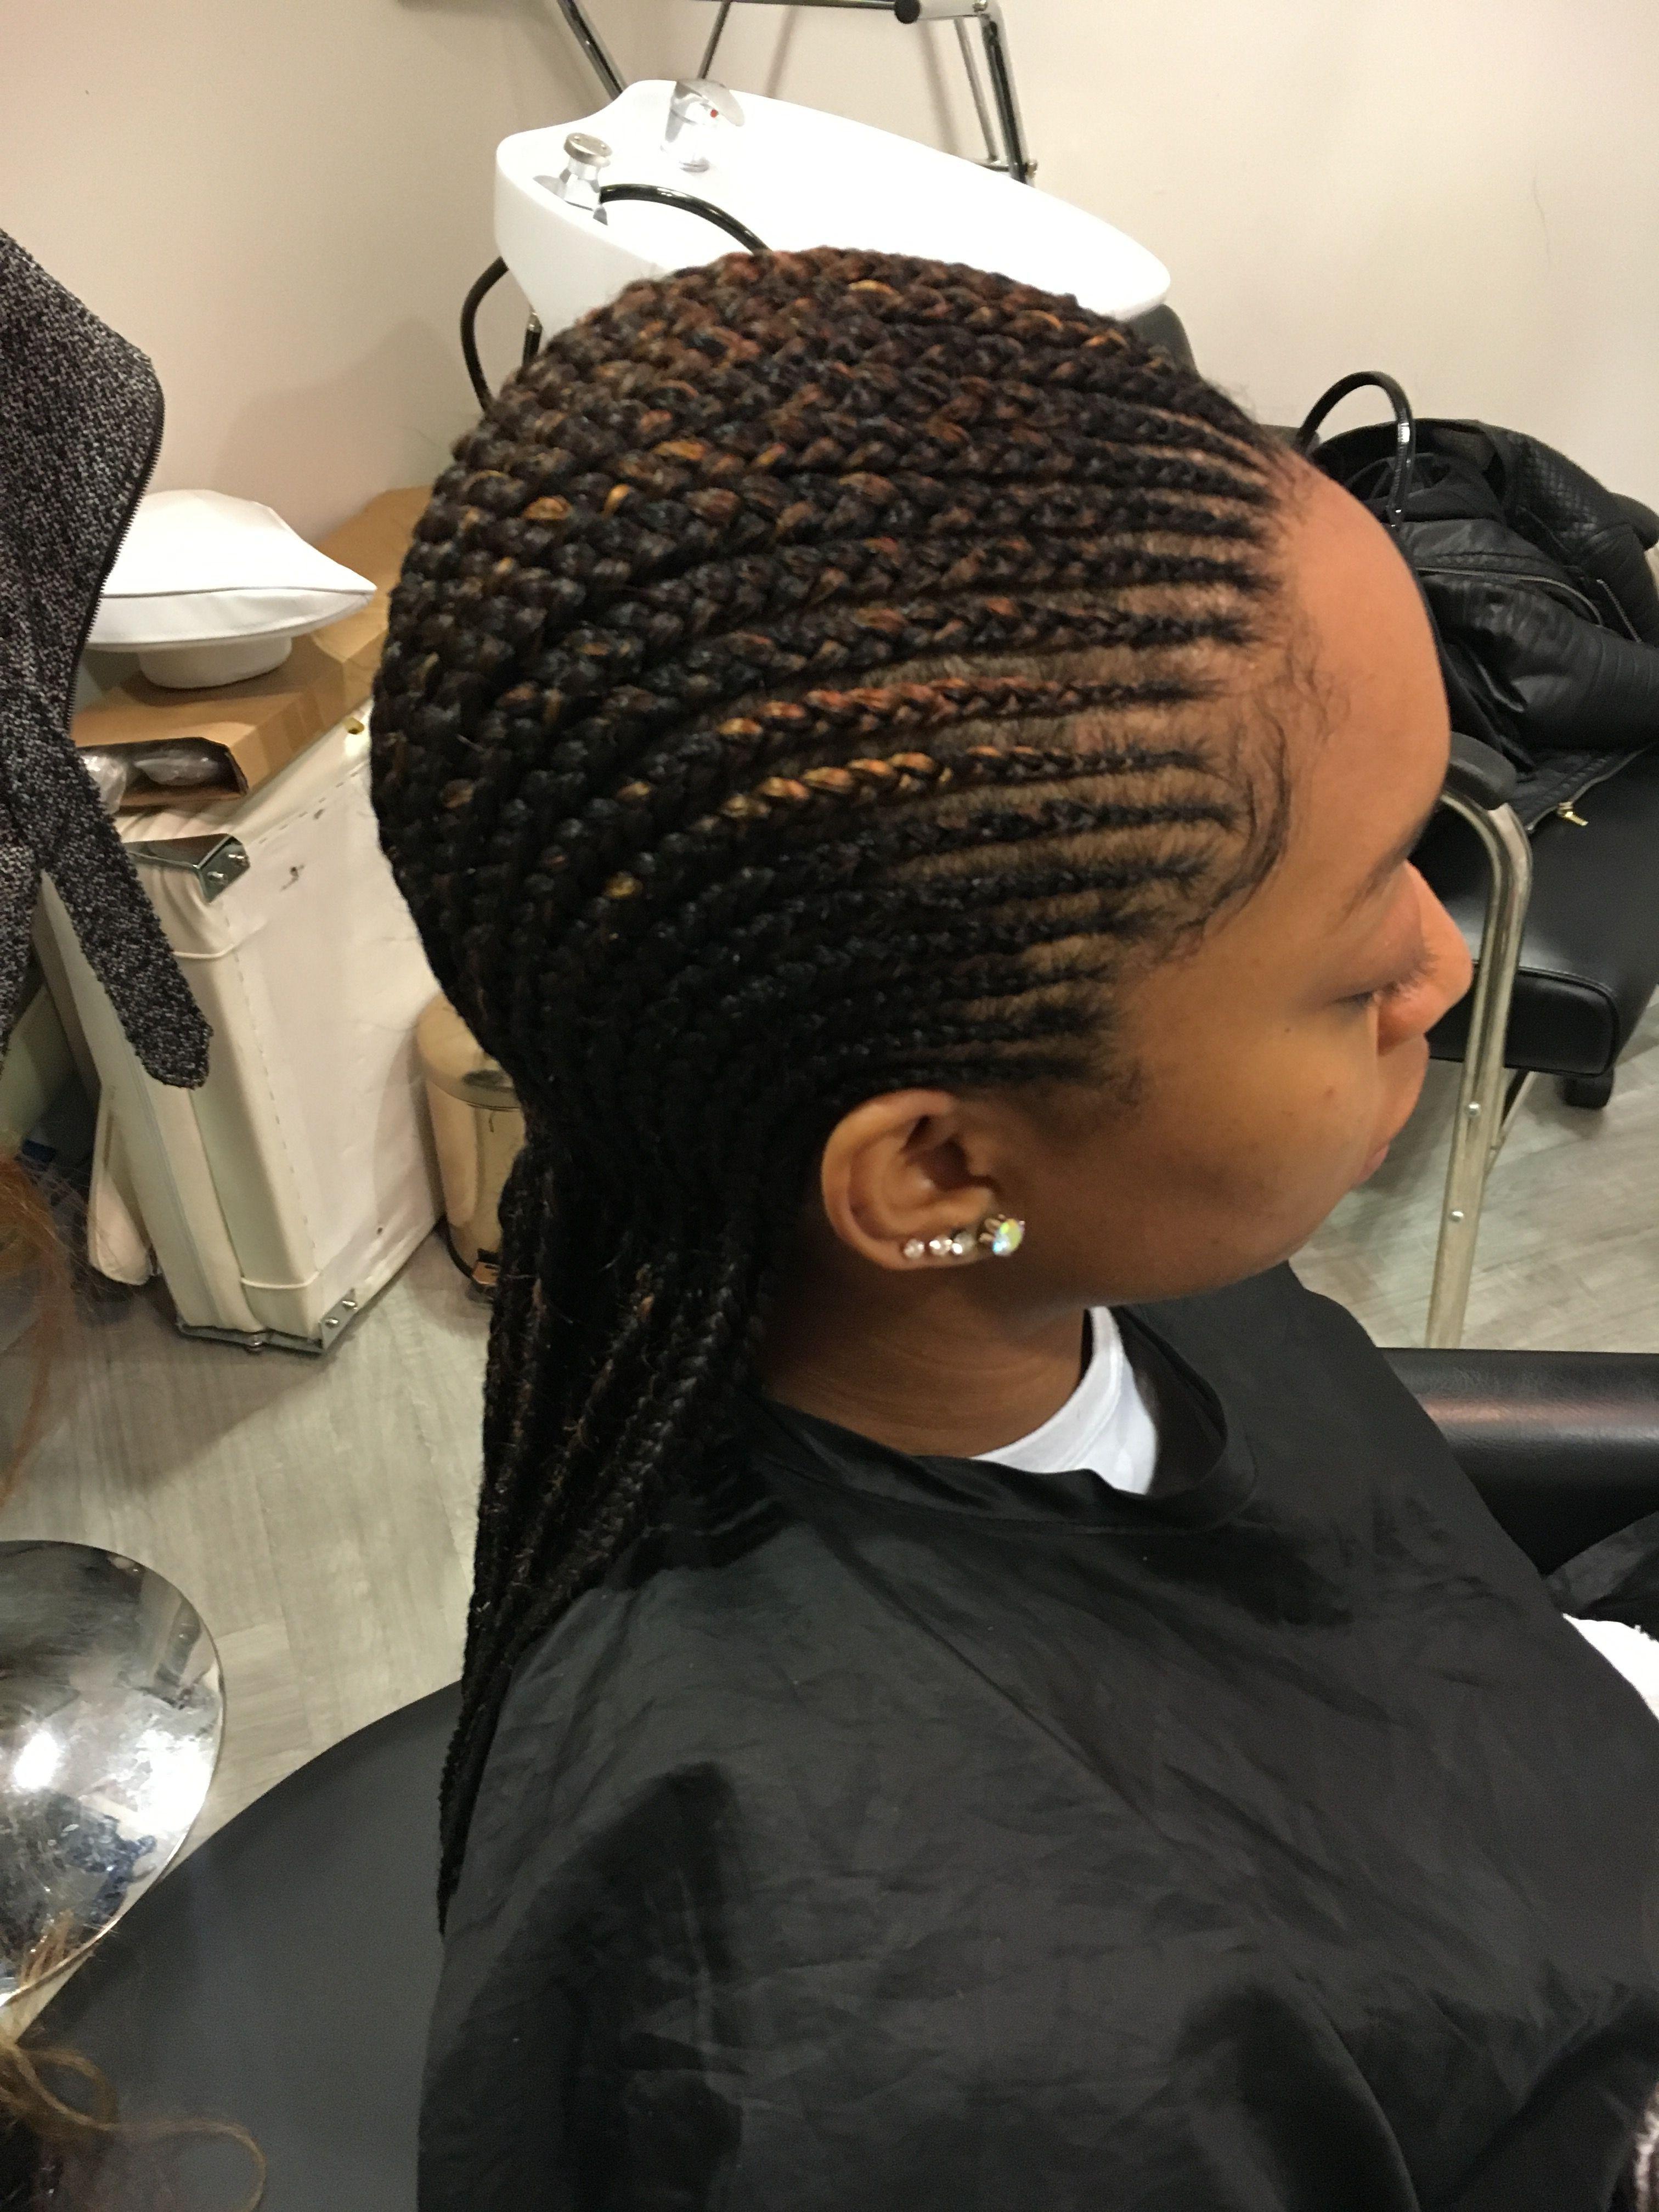 Braids Hairstyles 2018 2019 Straight Back Url Https Greathairs Blogspot Com 2018 03 Braids Hair Straight Back Braids Braided Hairstyles Cornrow Hairstyles